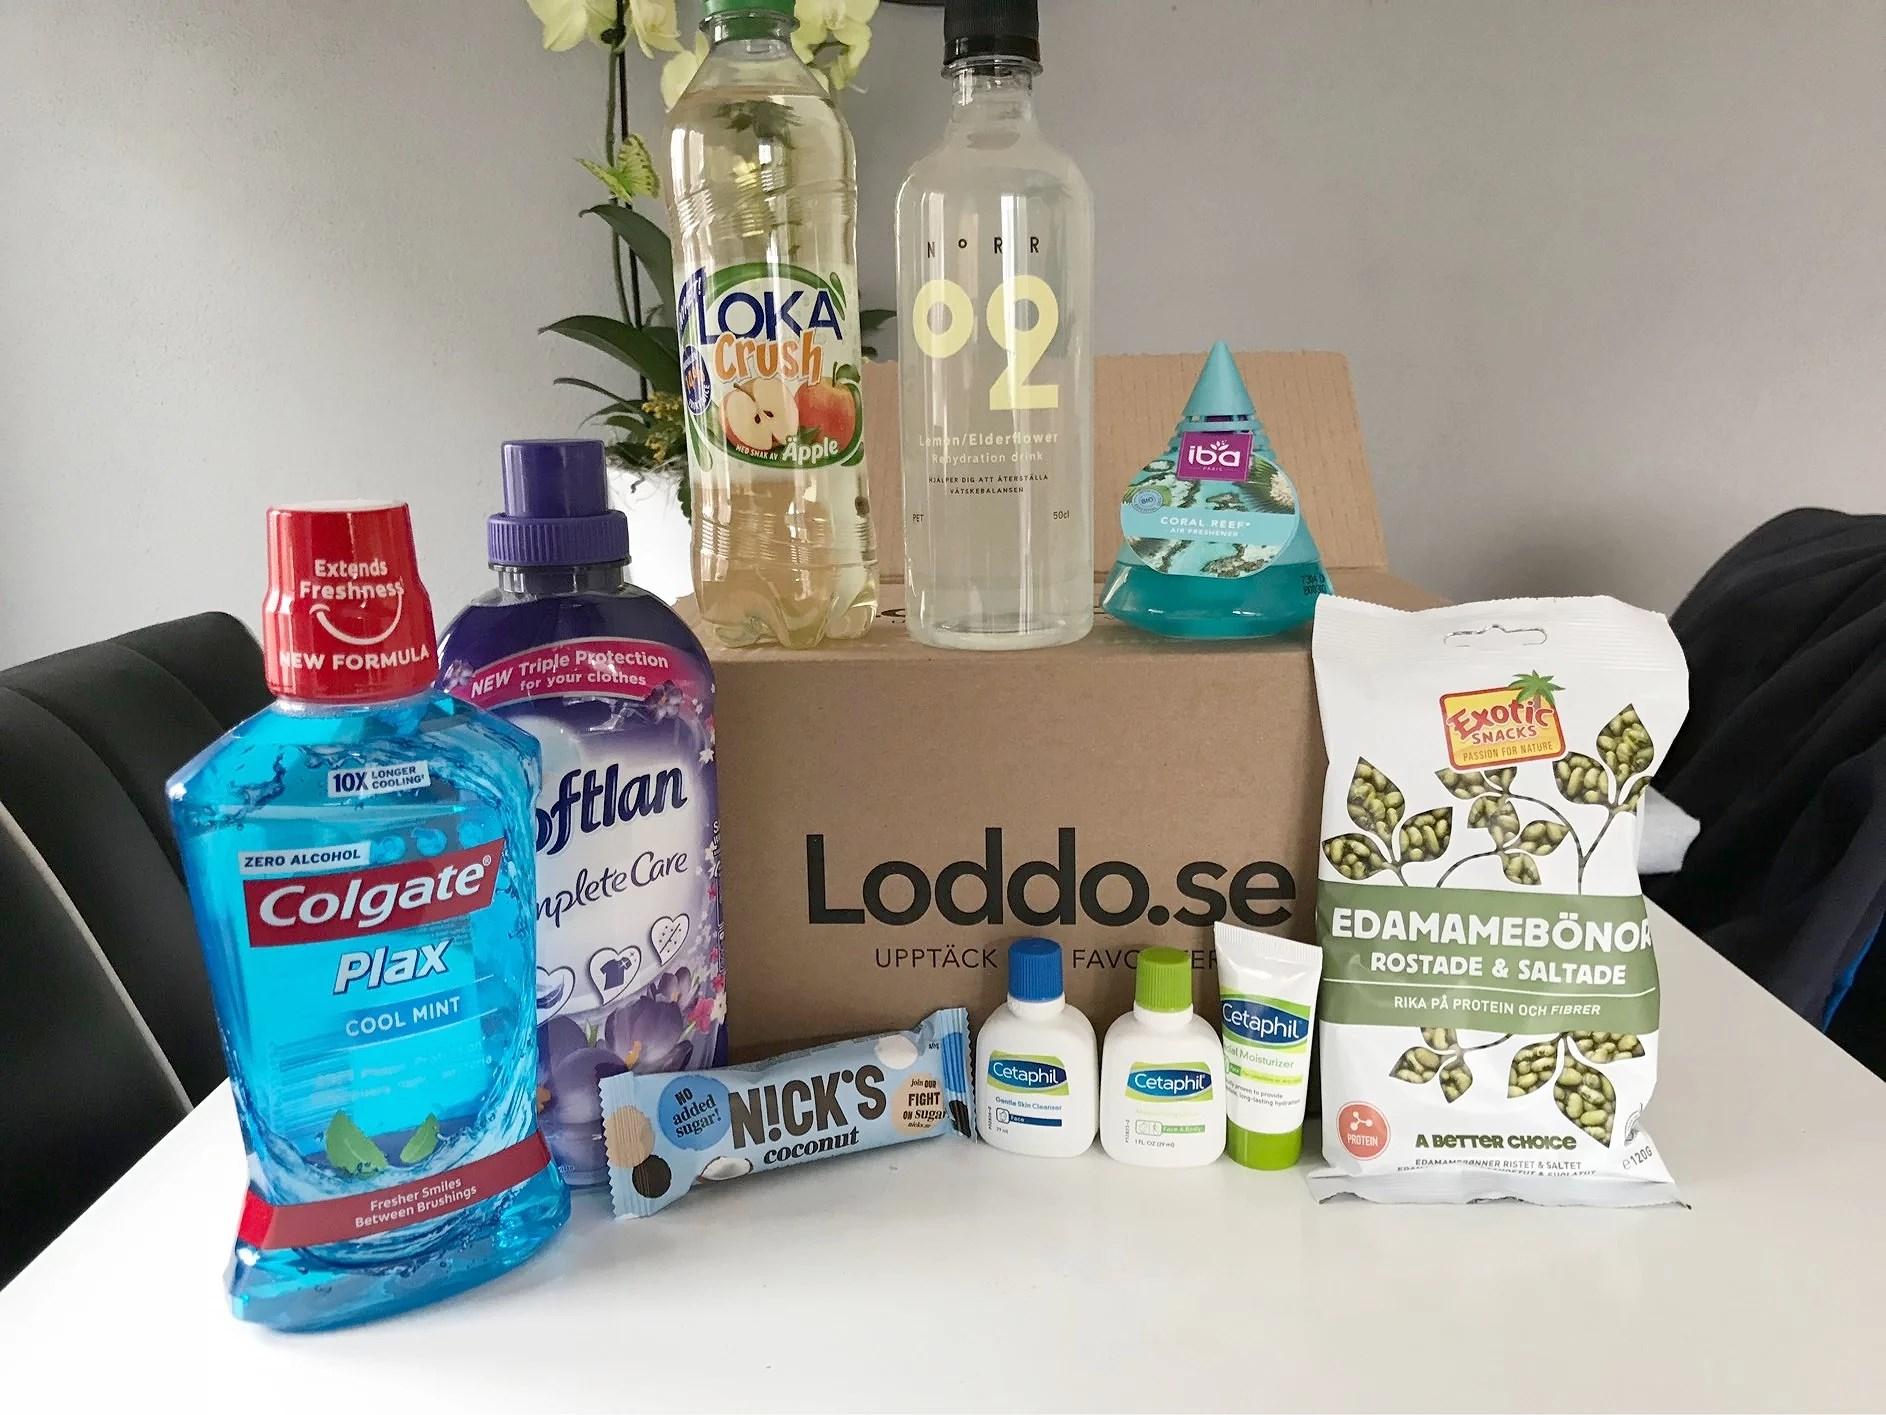 Loddo - Marsboxen